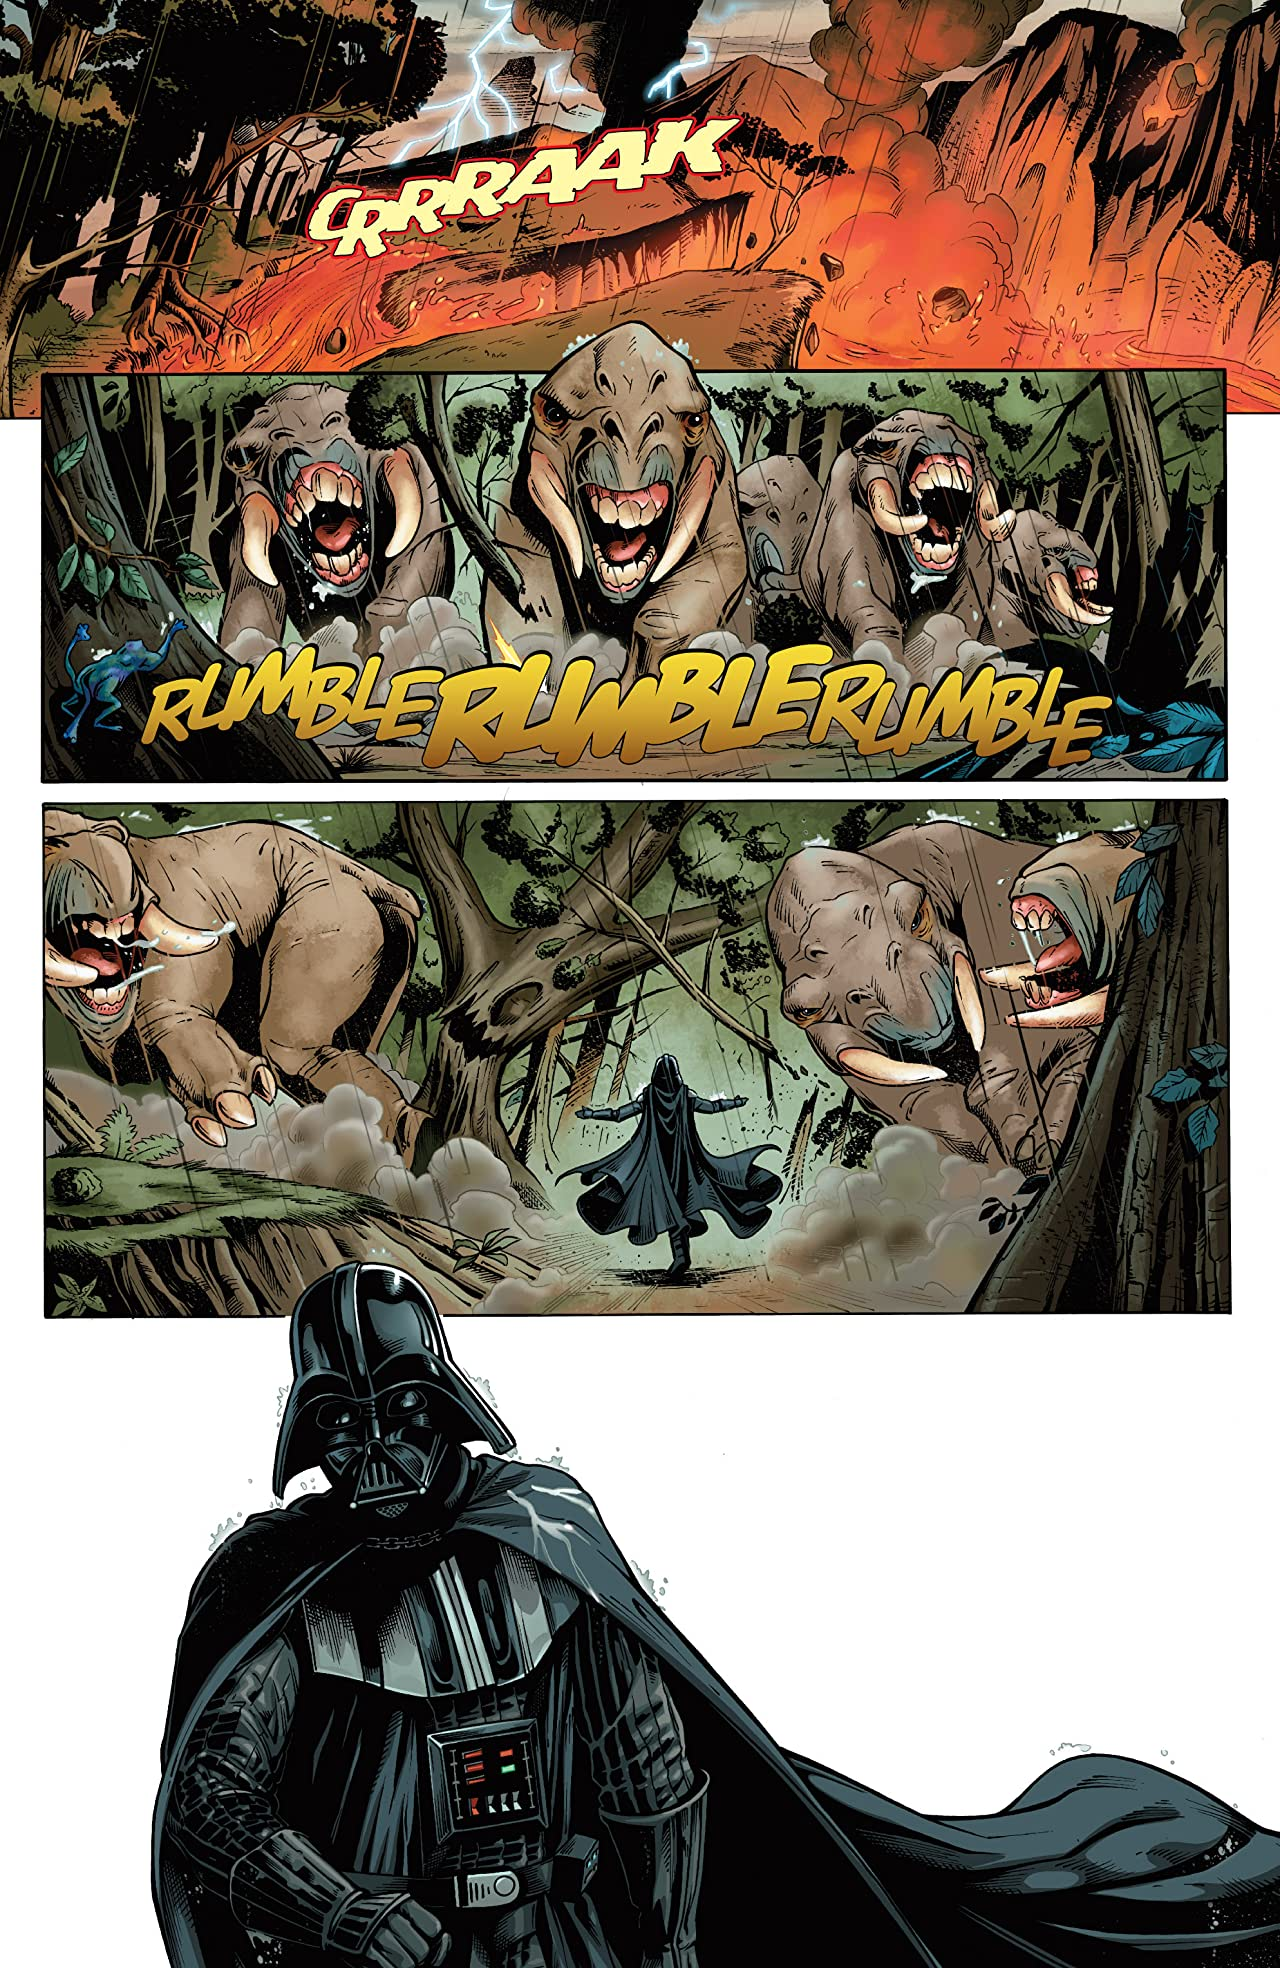 Star Wars: Darth Vader and the Ninth Assassin (2013) #5 (of 5)